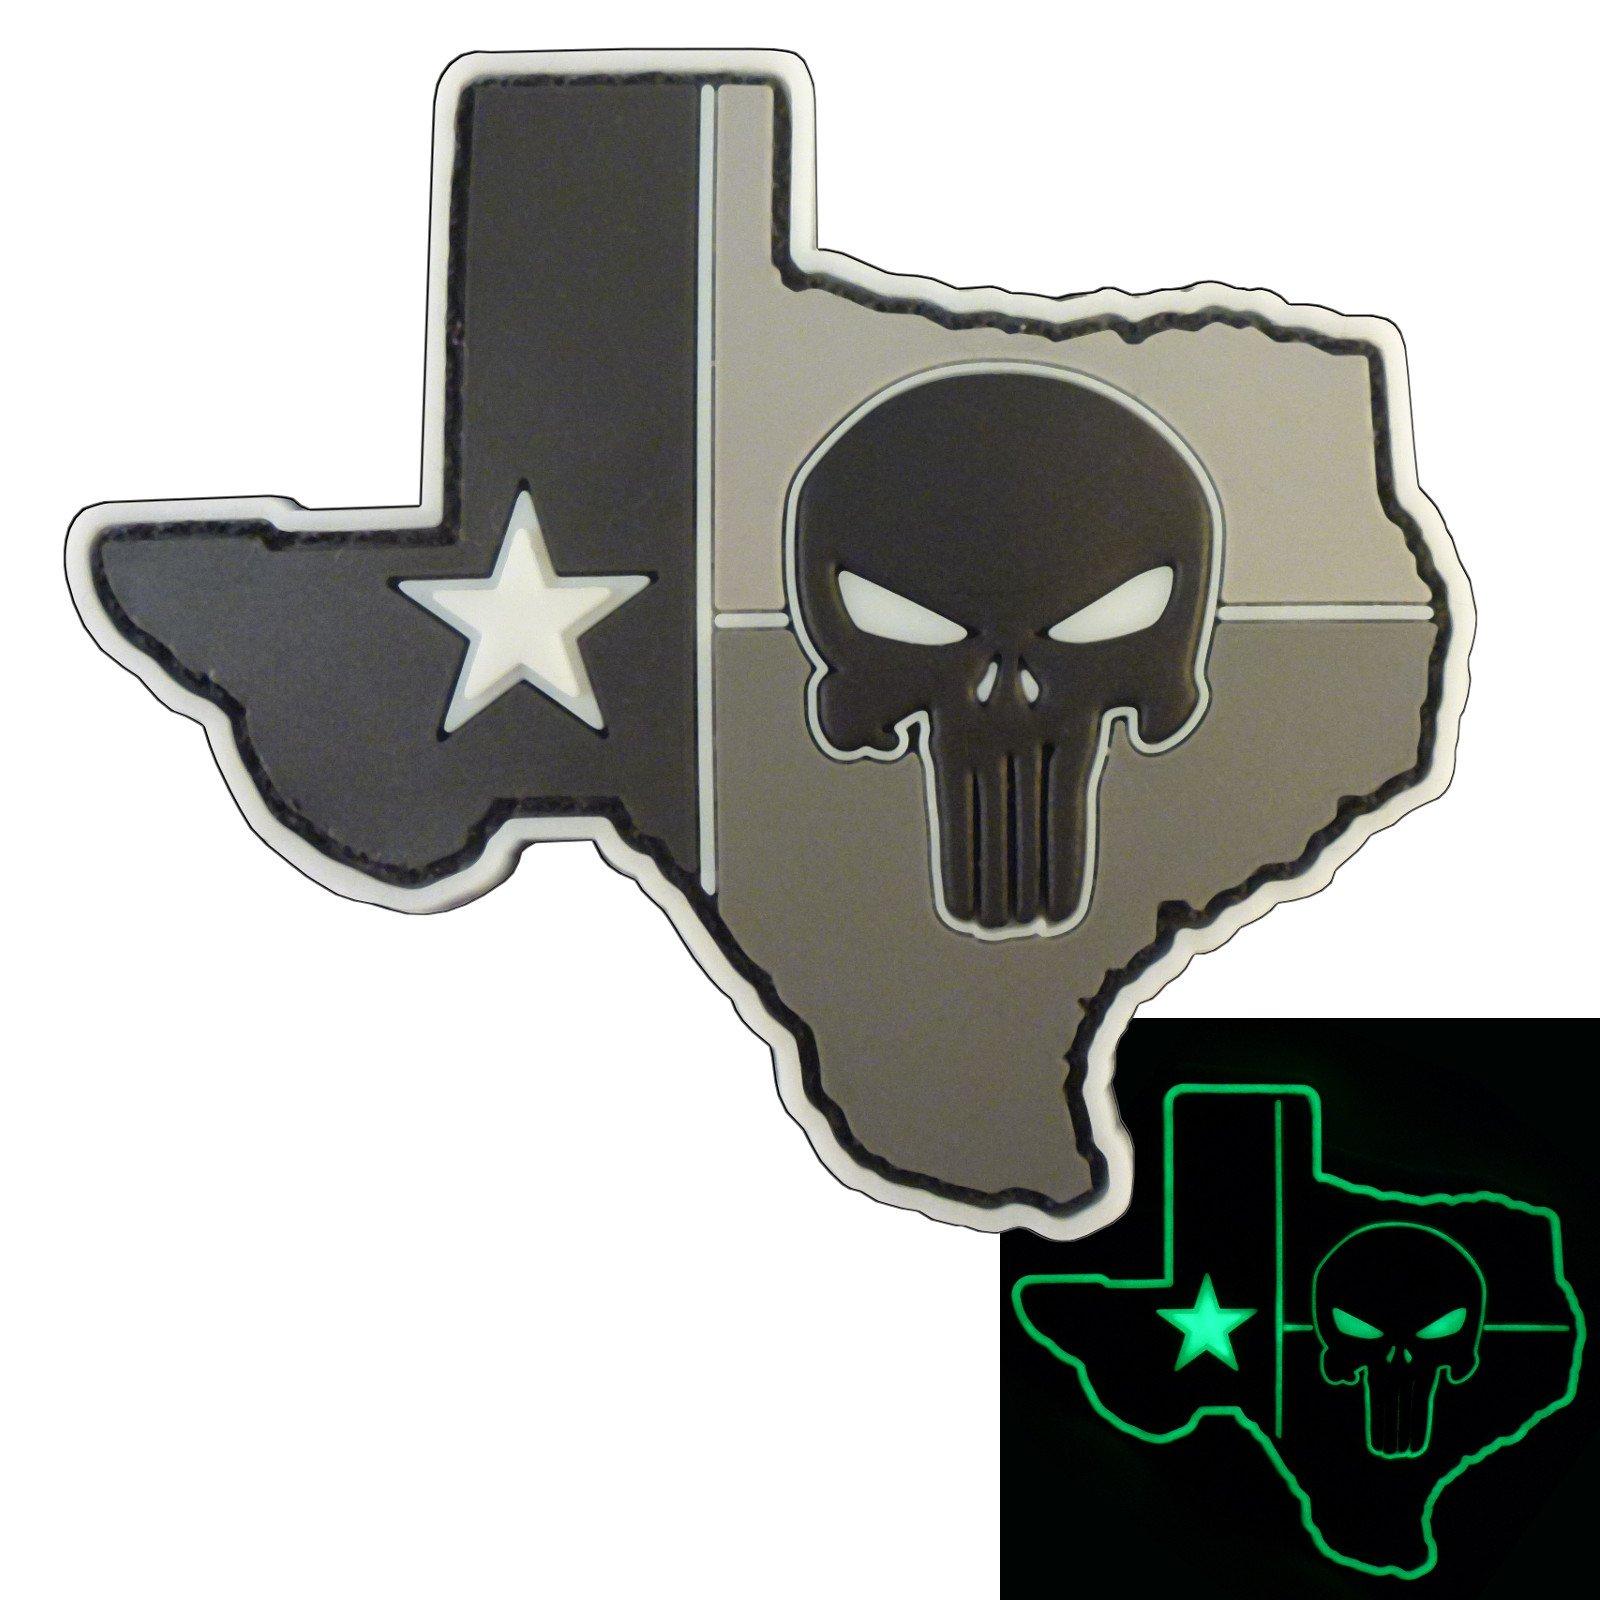 3 /% III Percent PVC Glow Ranger Eye Patch Defend Liberty NRA GITD Morale Hook